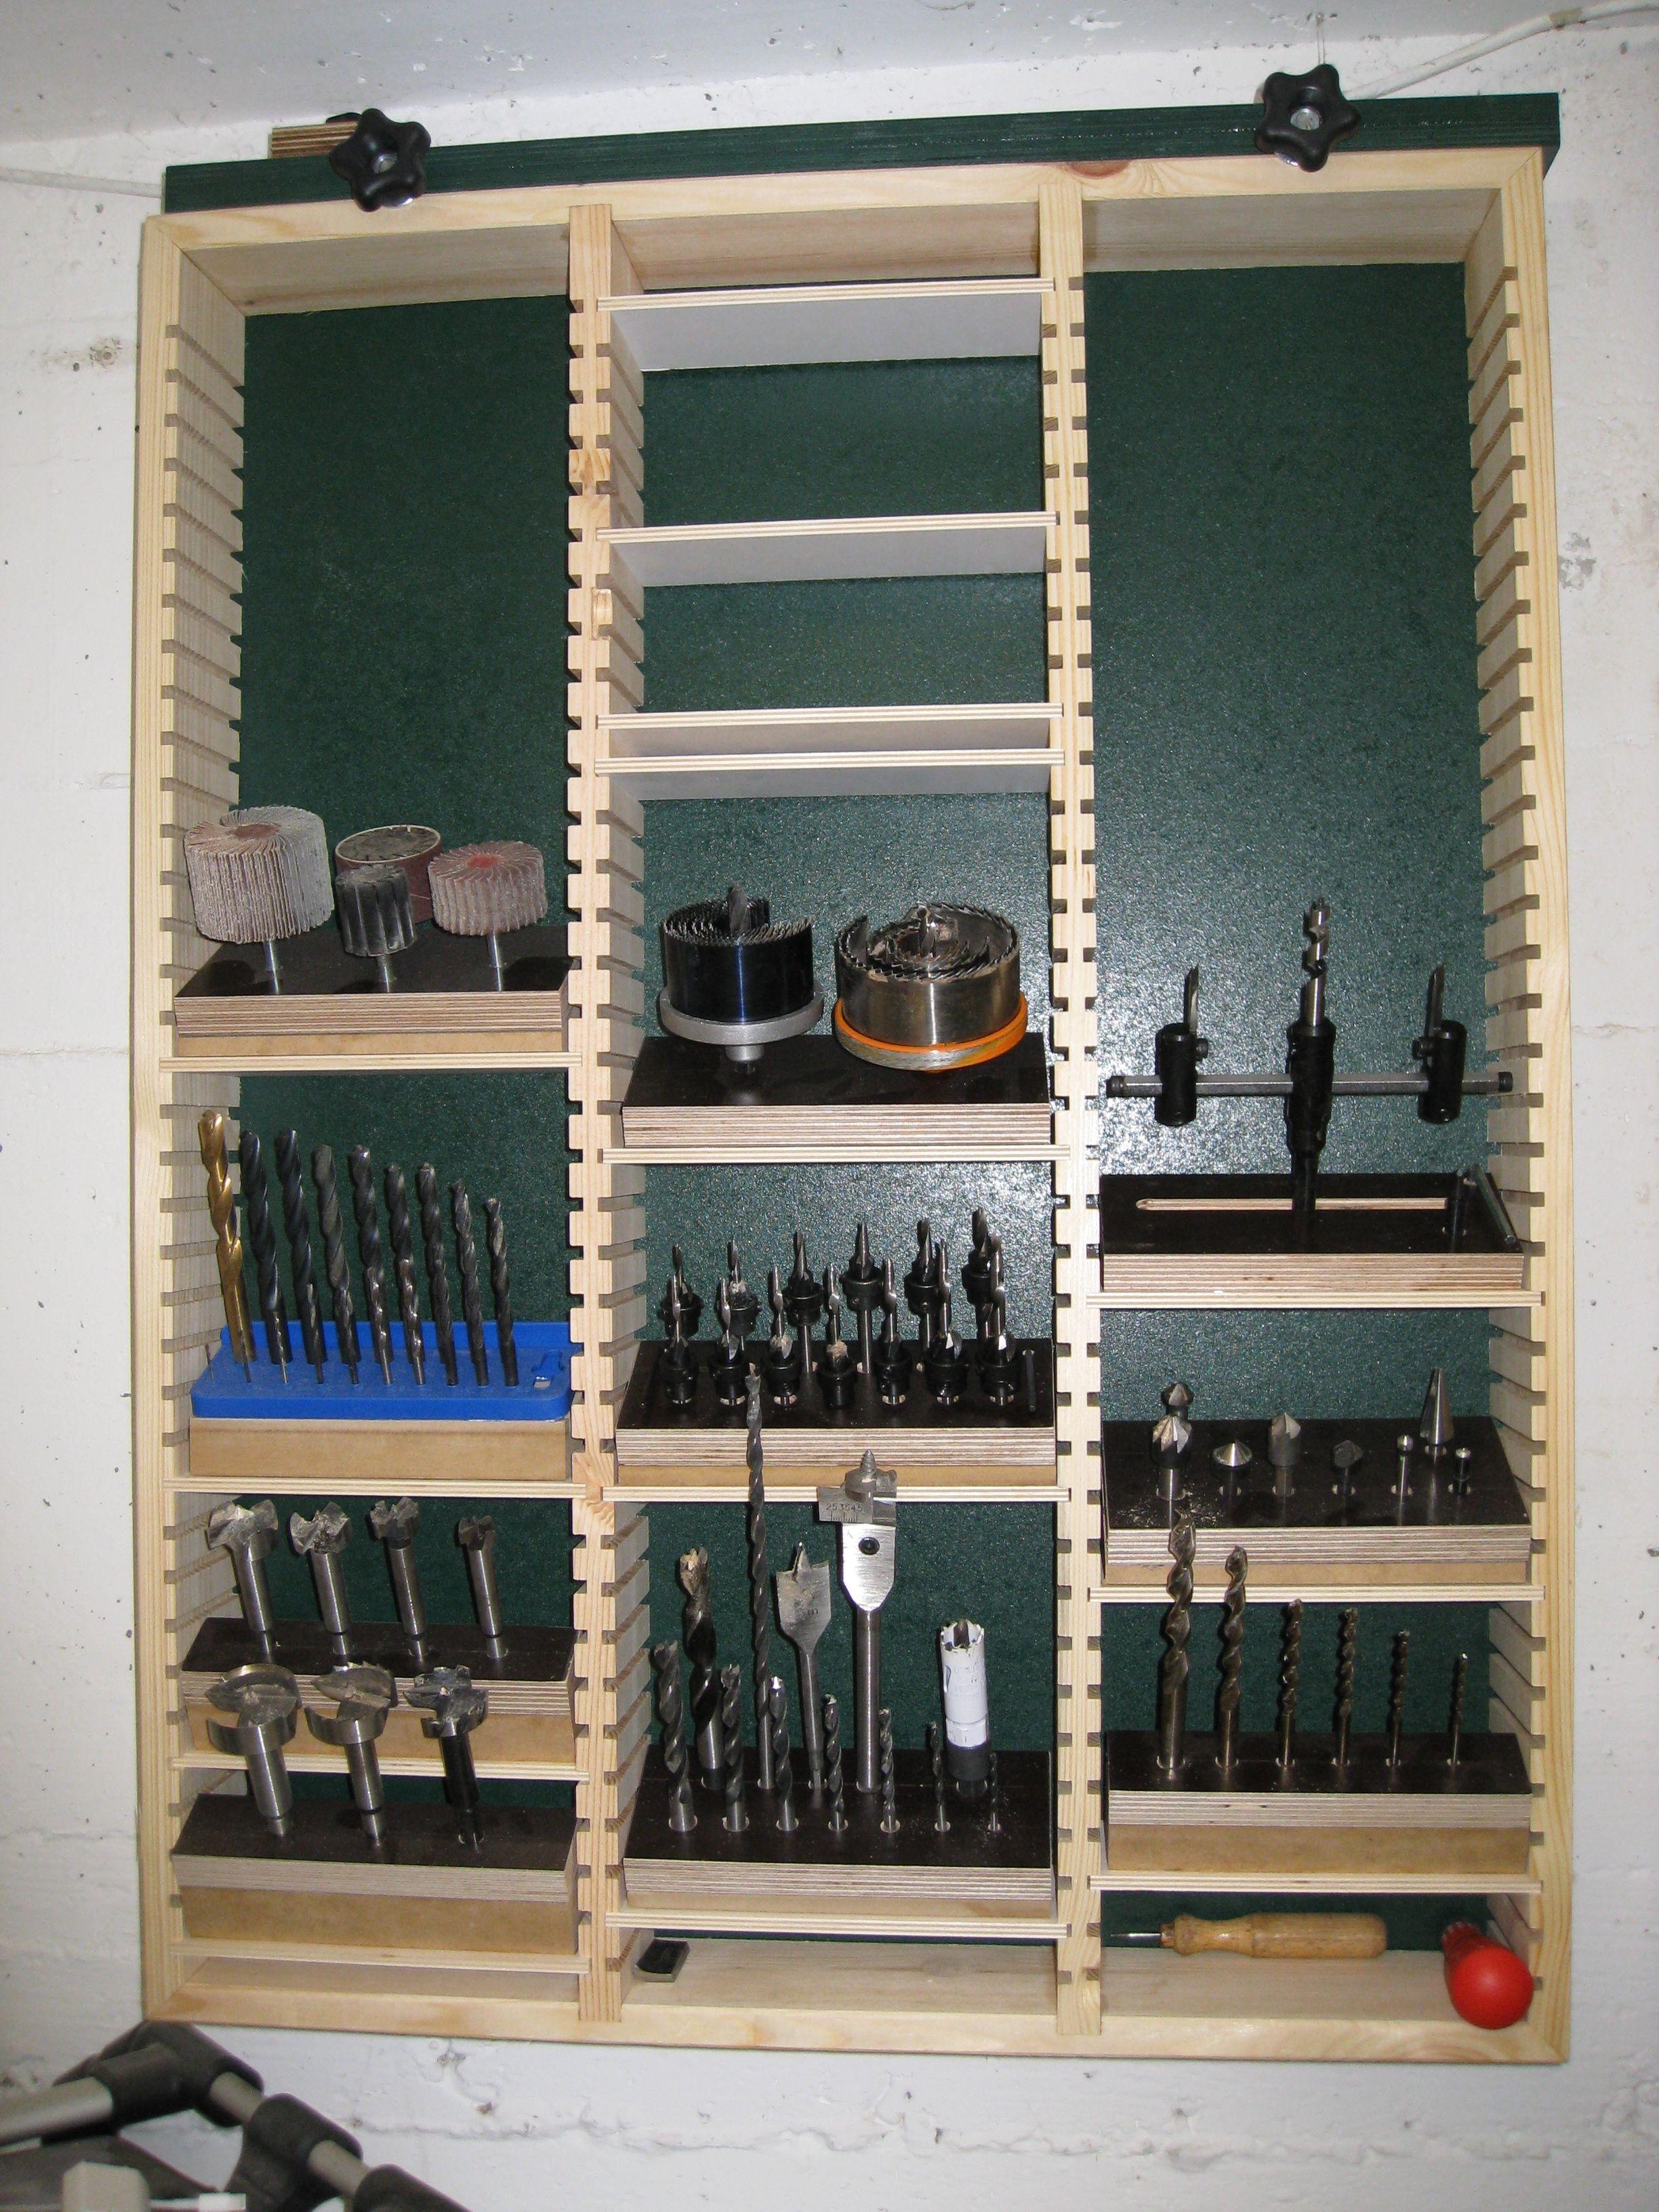 bohrerregal bauanleitung zum selber bauen heimwerker forum werkstatt pinterest. Black Bedroom Furniture Sets. Home Design Ideas